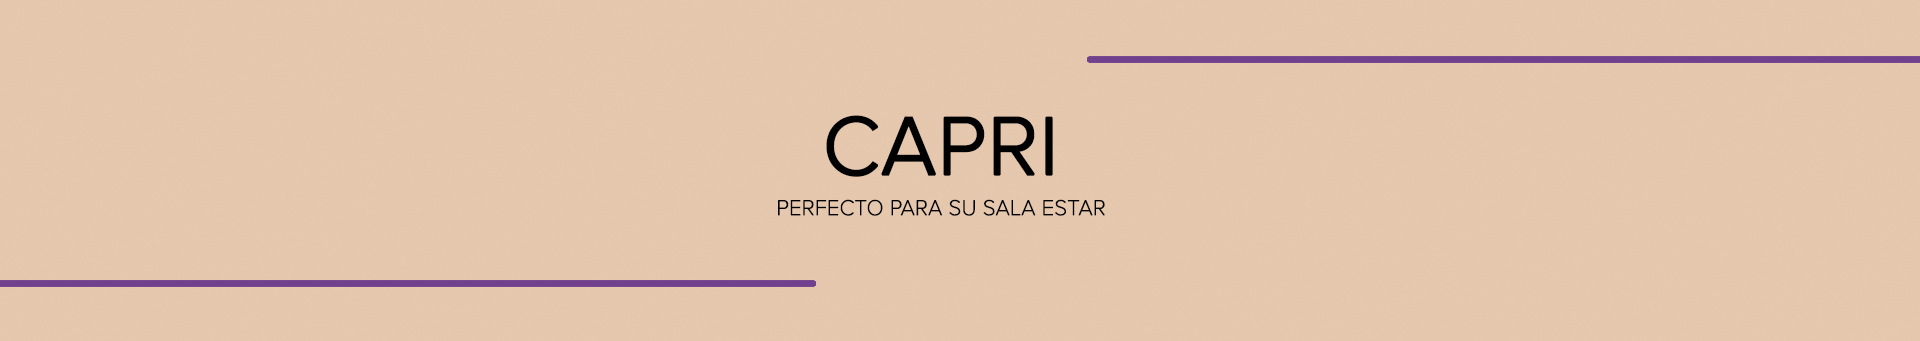 Panel Capri